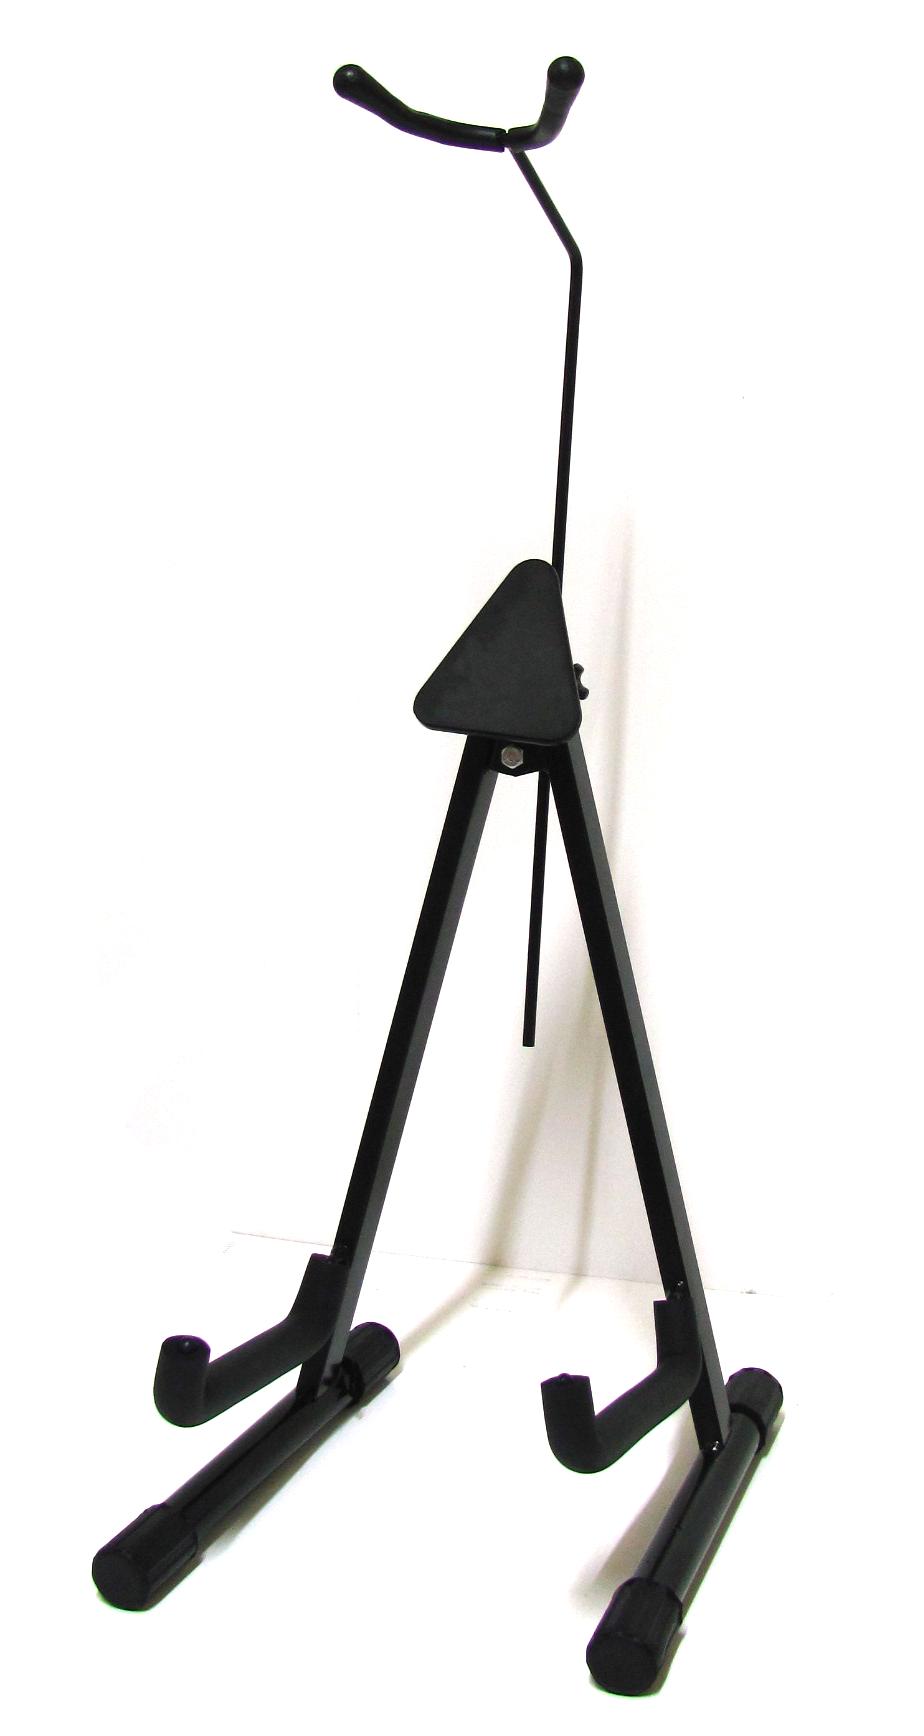 Guitar Stand ขาตั้งกีตาร์ แบบ สามเหลี่ม